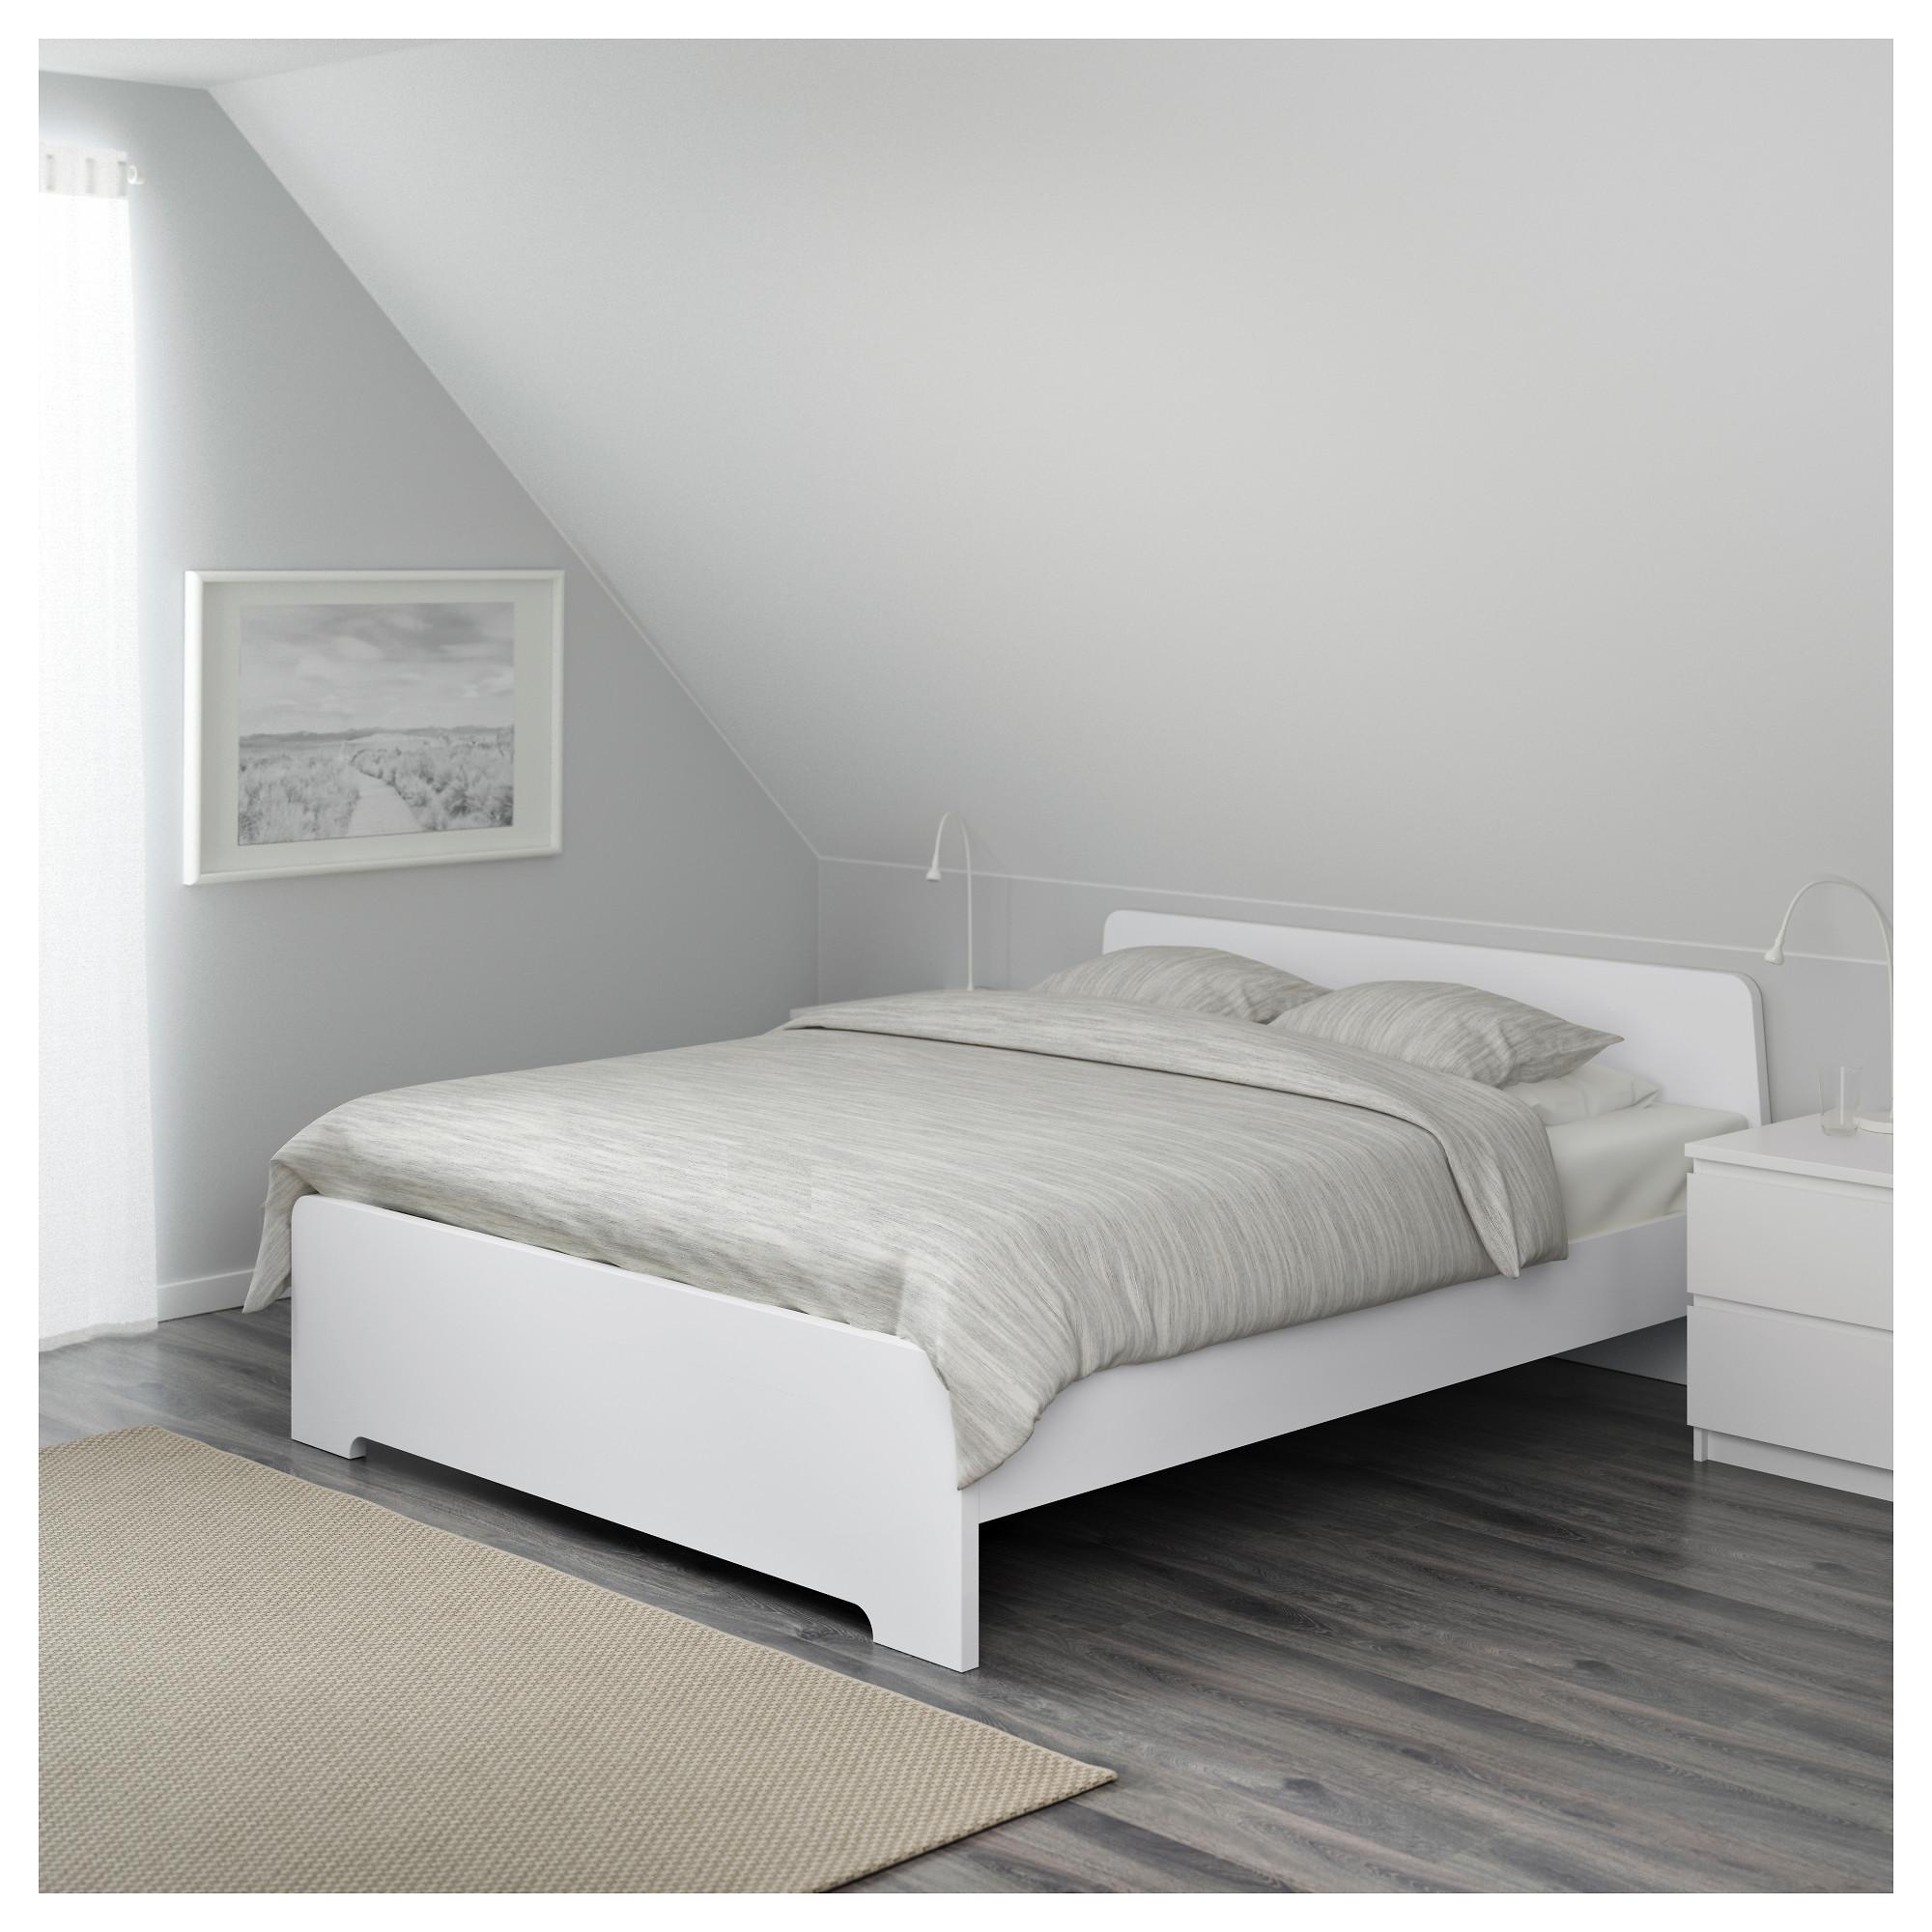 Askvoll Bed Frame Double Ikea Hong Kong